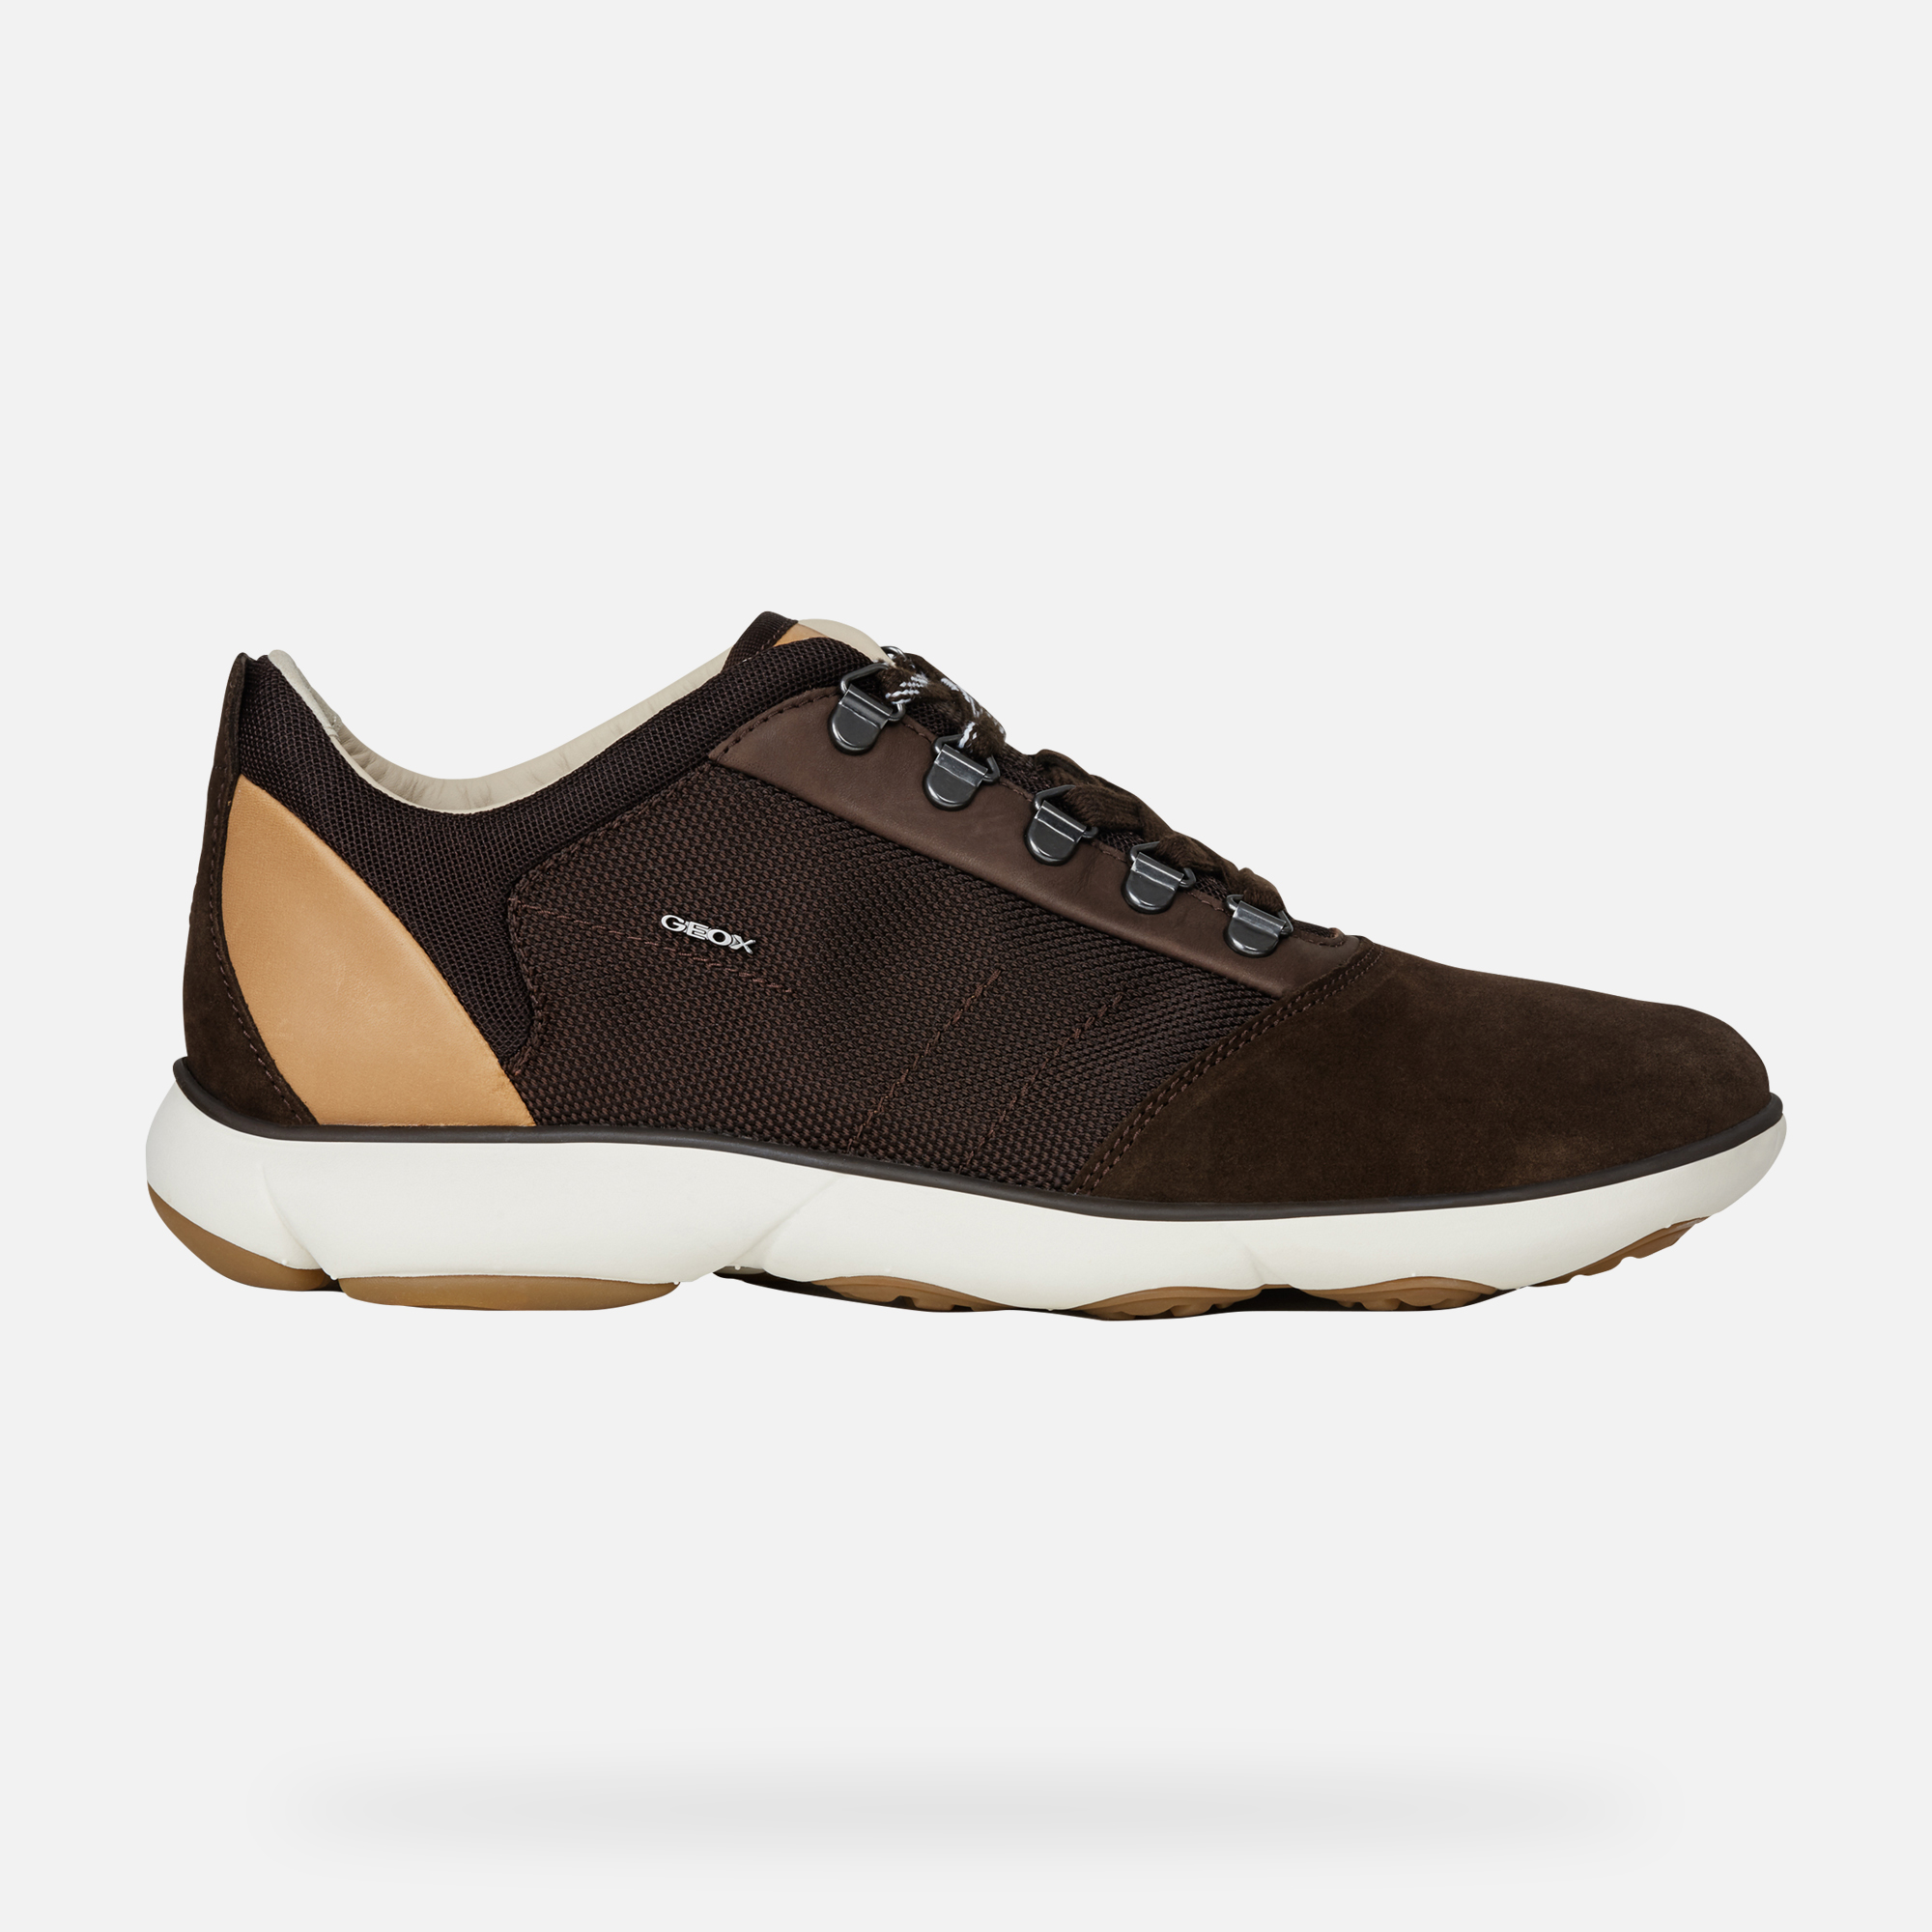 Geox U NEBULA: Brown Man Sneakers